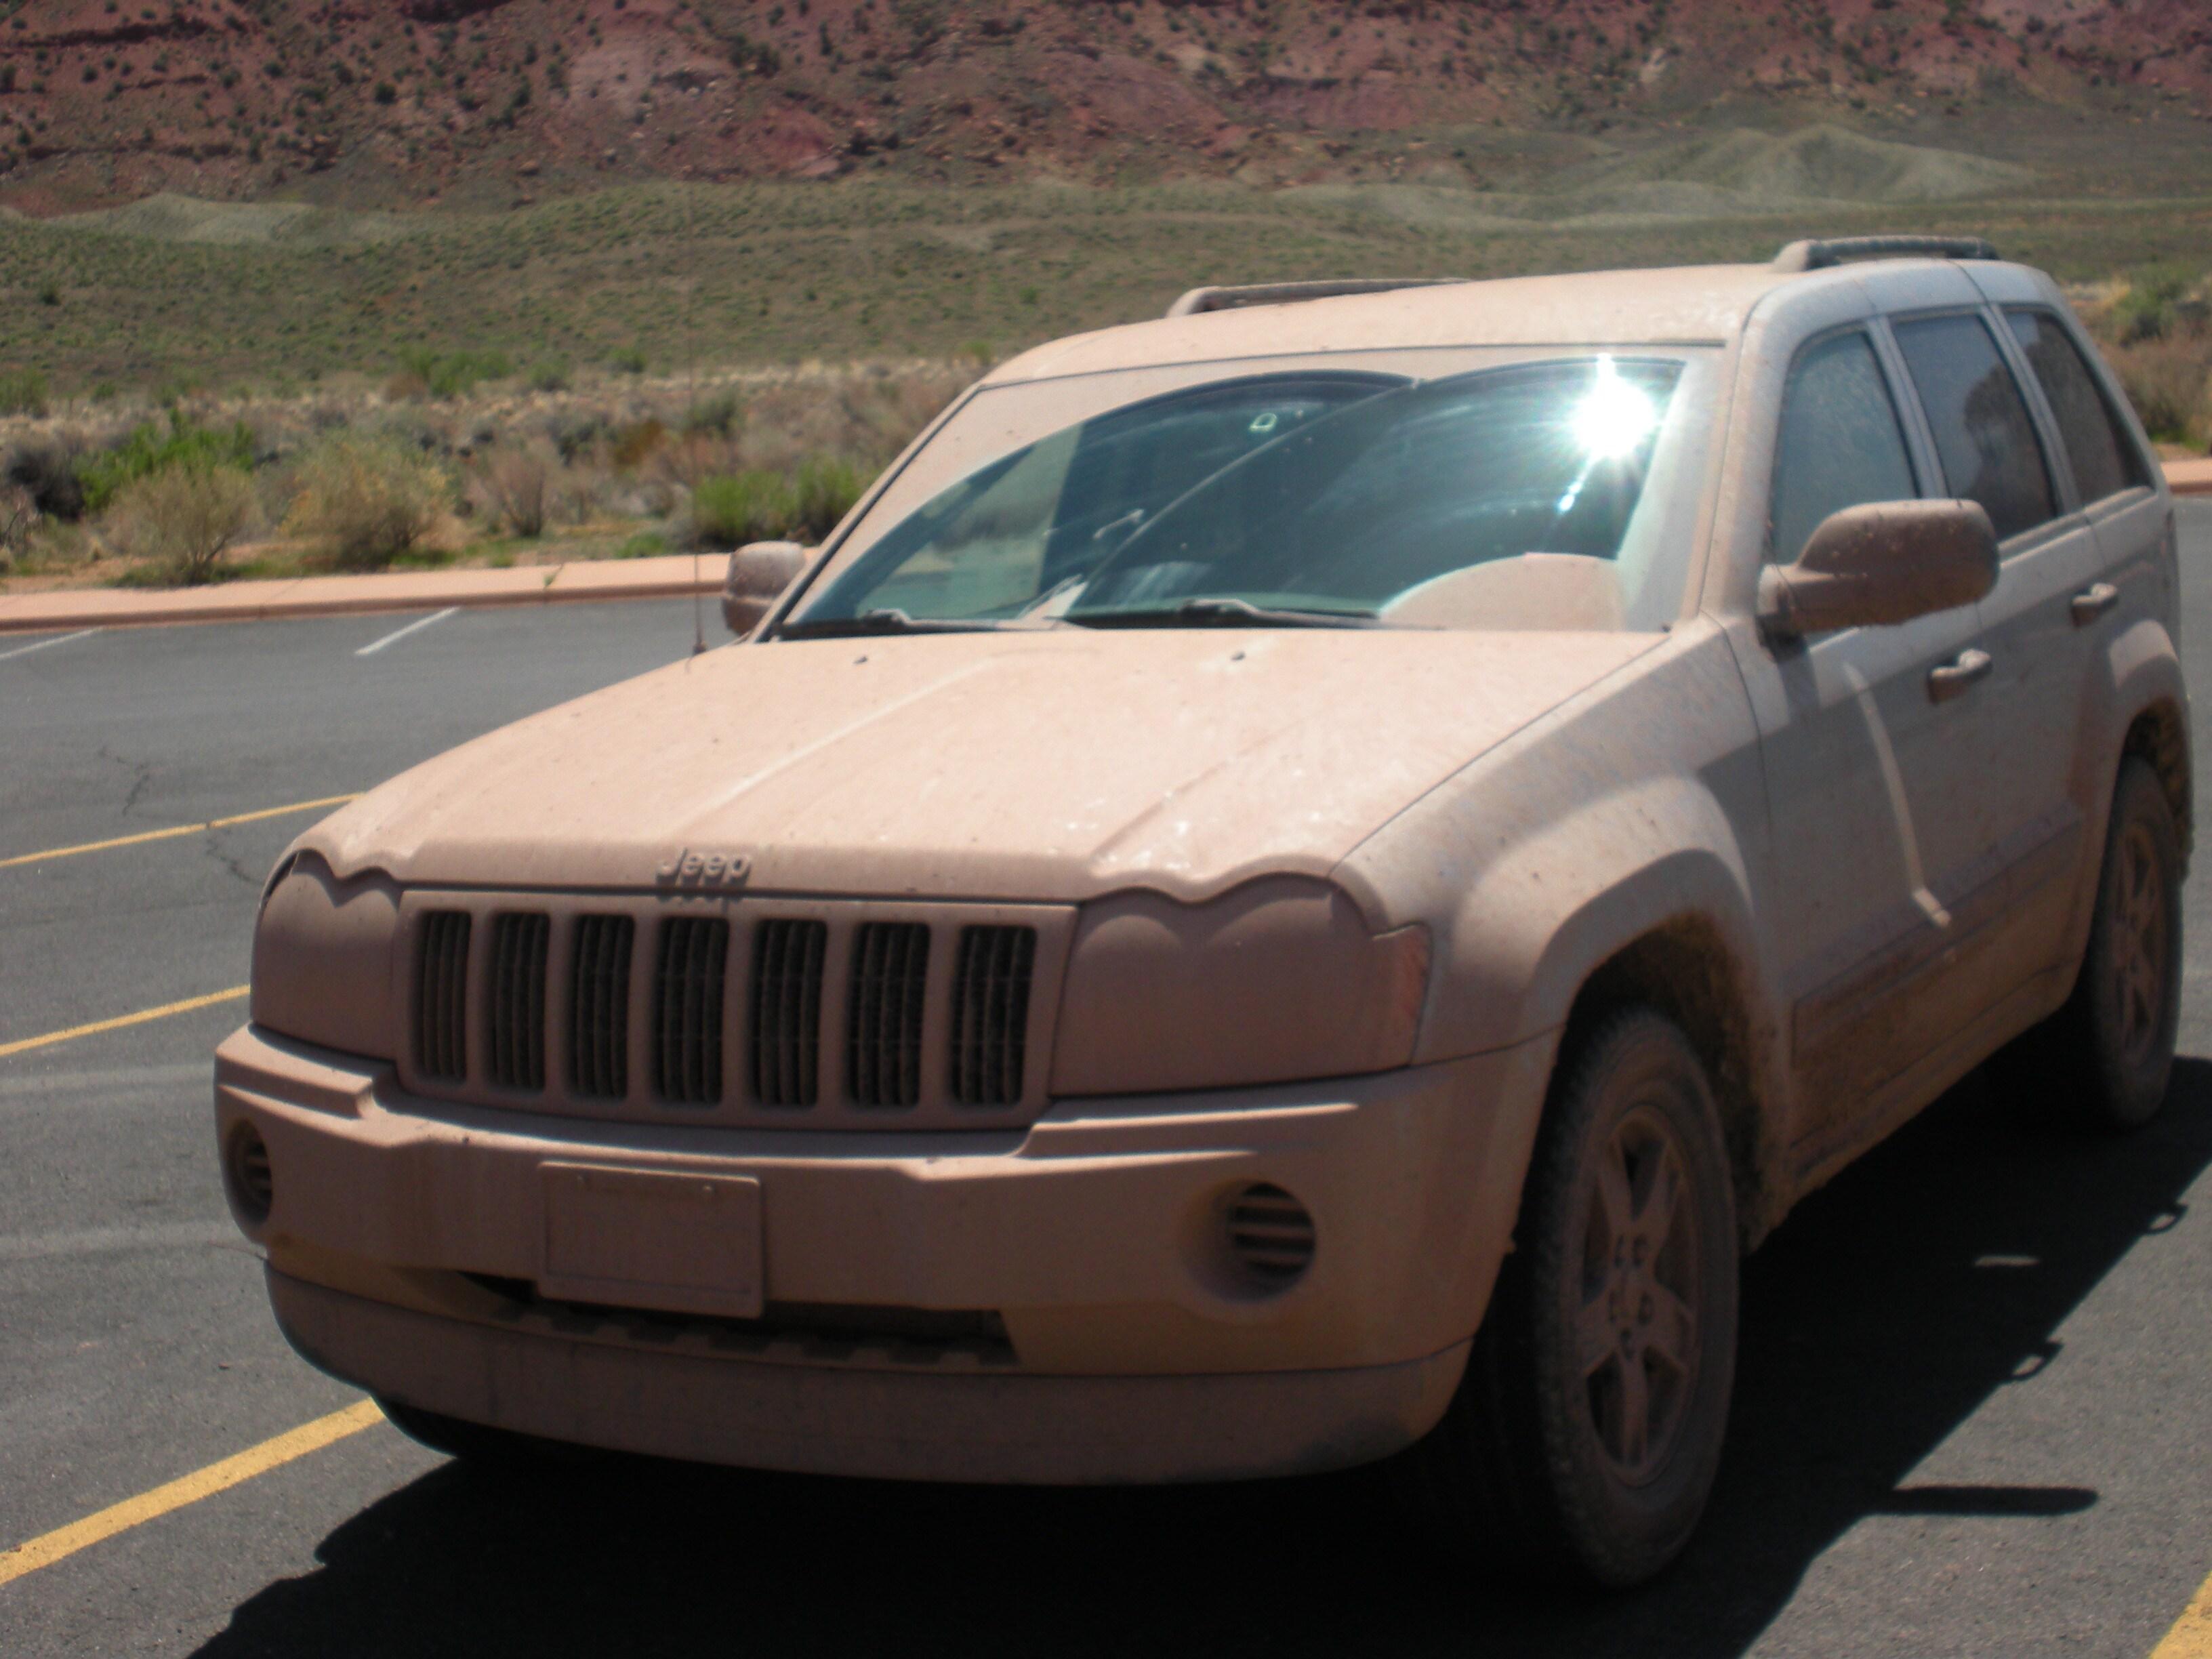 Superior Park Chrysler Jeep | New Chrysler, Jeep Dealership In Burnsville, MN ...